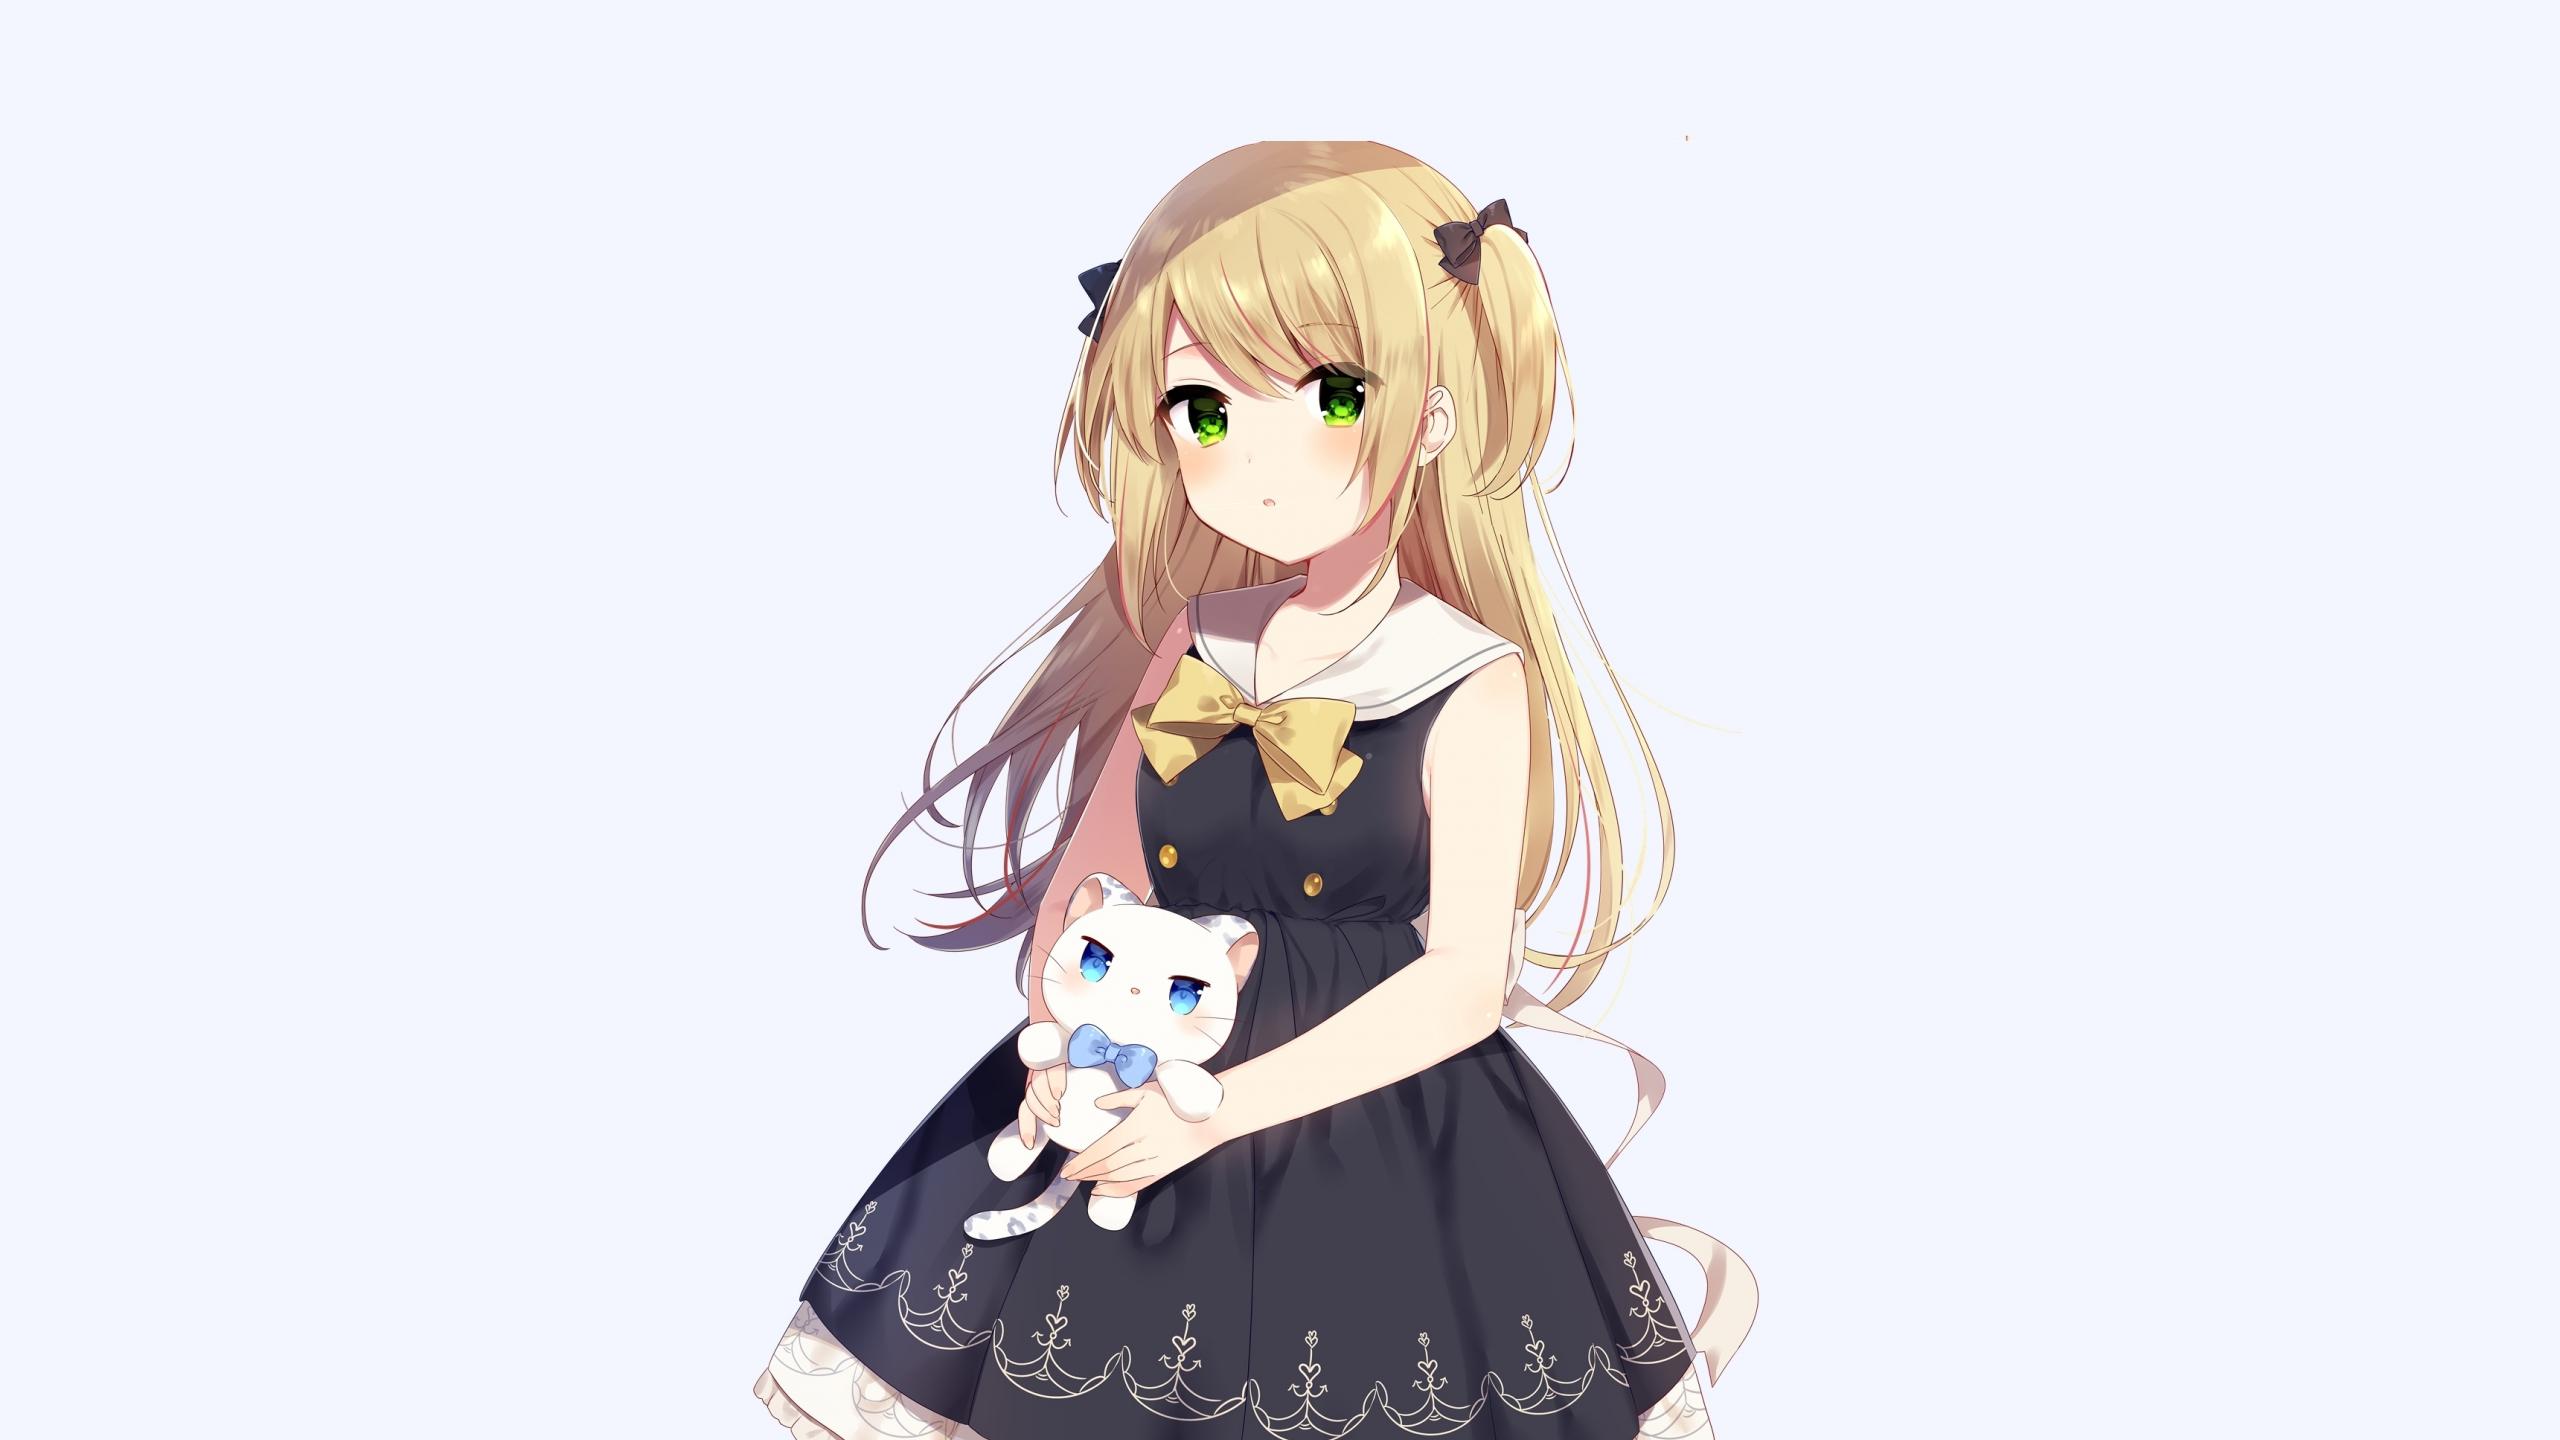 Cute anime girl and her kitten original 2560x1440 wallpaper